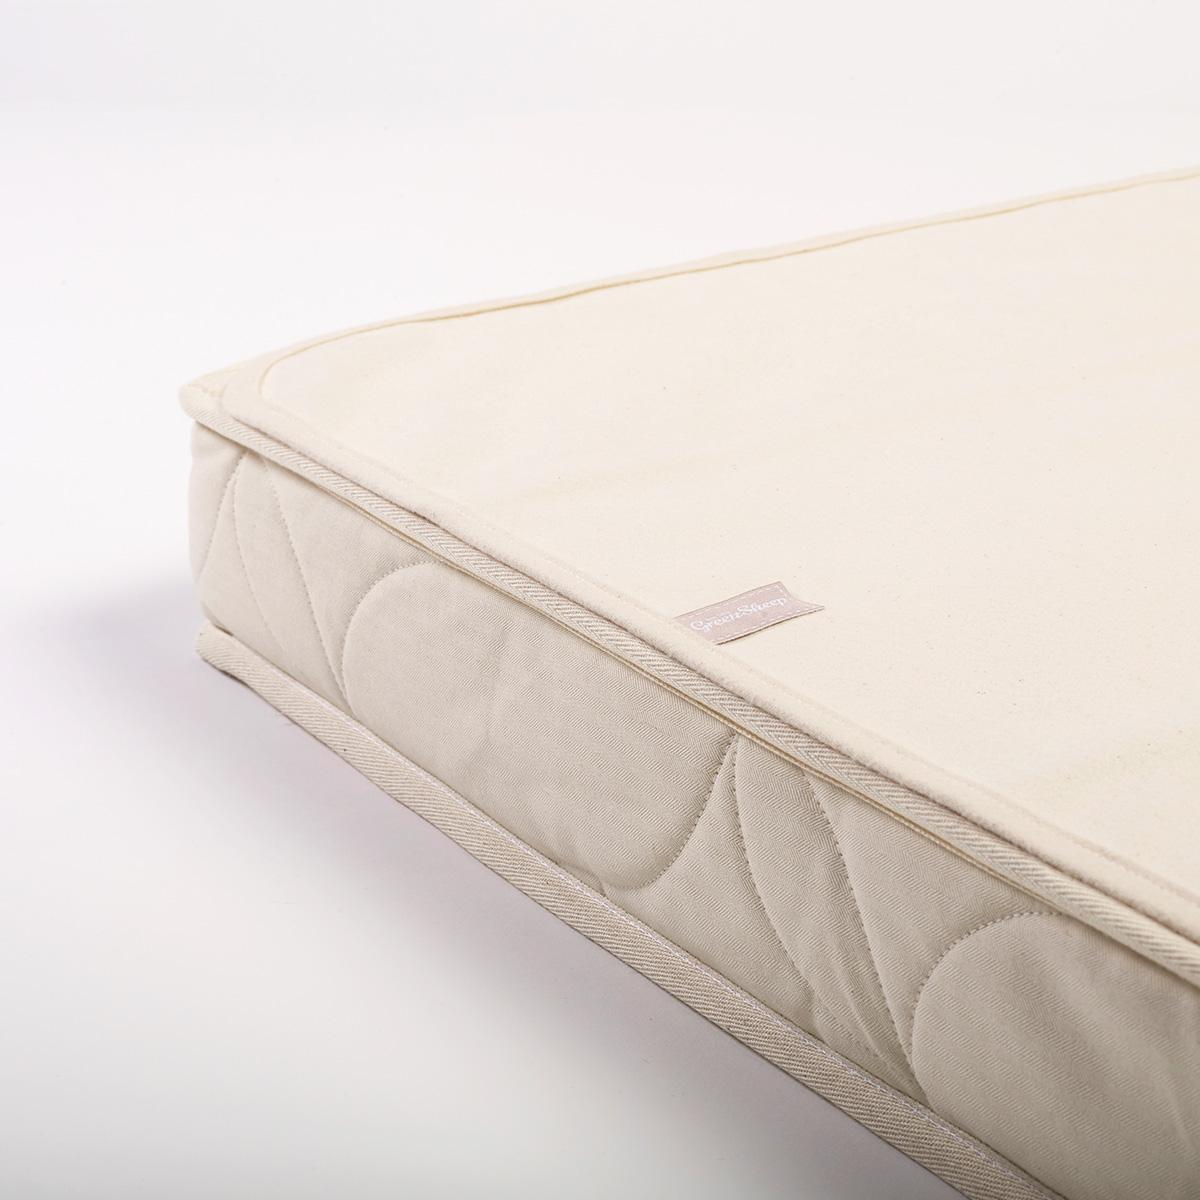 The Little Green Sheep Waterproof SnuzKot 68x117 Cot Bed Mattress Protector